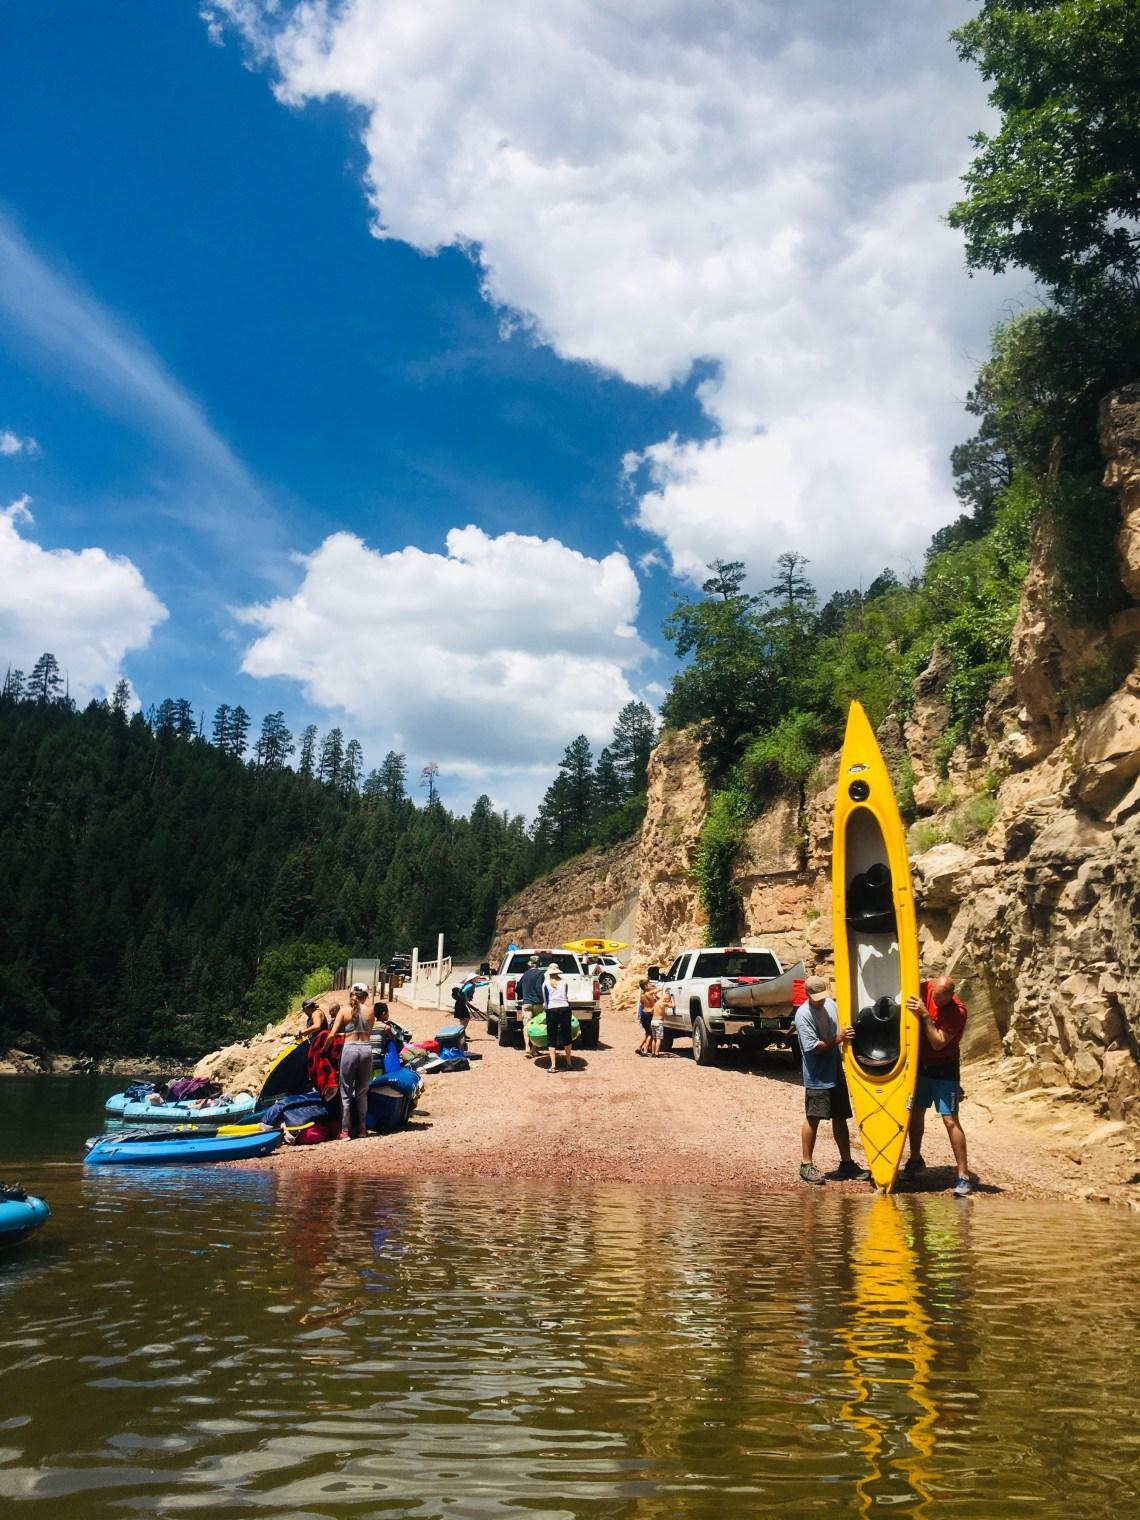 Blue Ridge Reservoir boat ramp and loading/unloading area